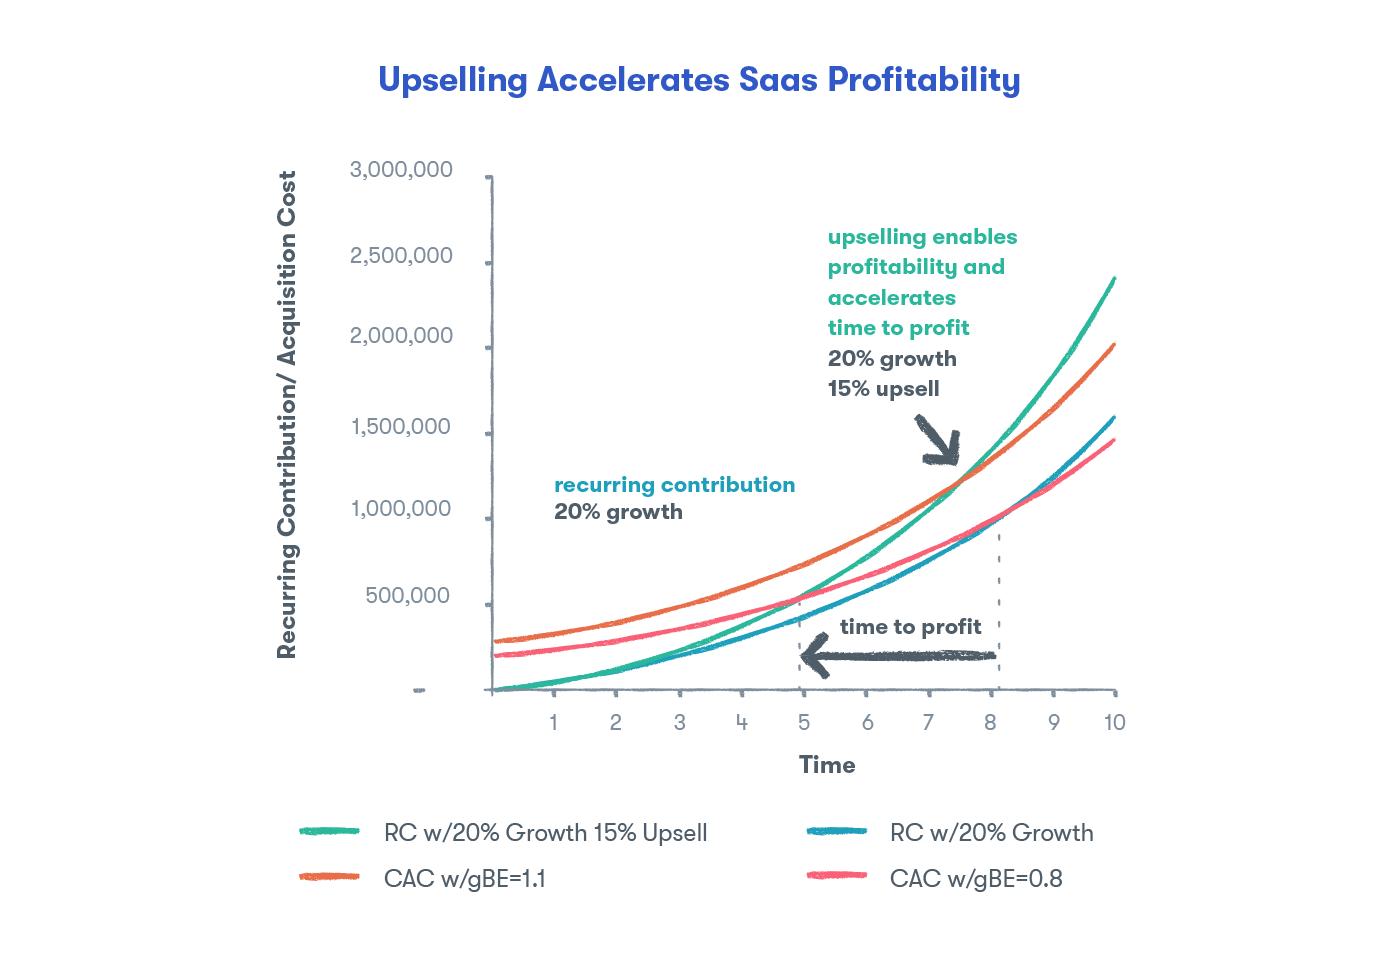 Upselling Accelerates SaaS Profitability